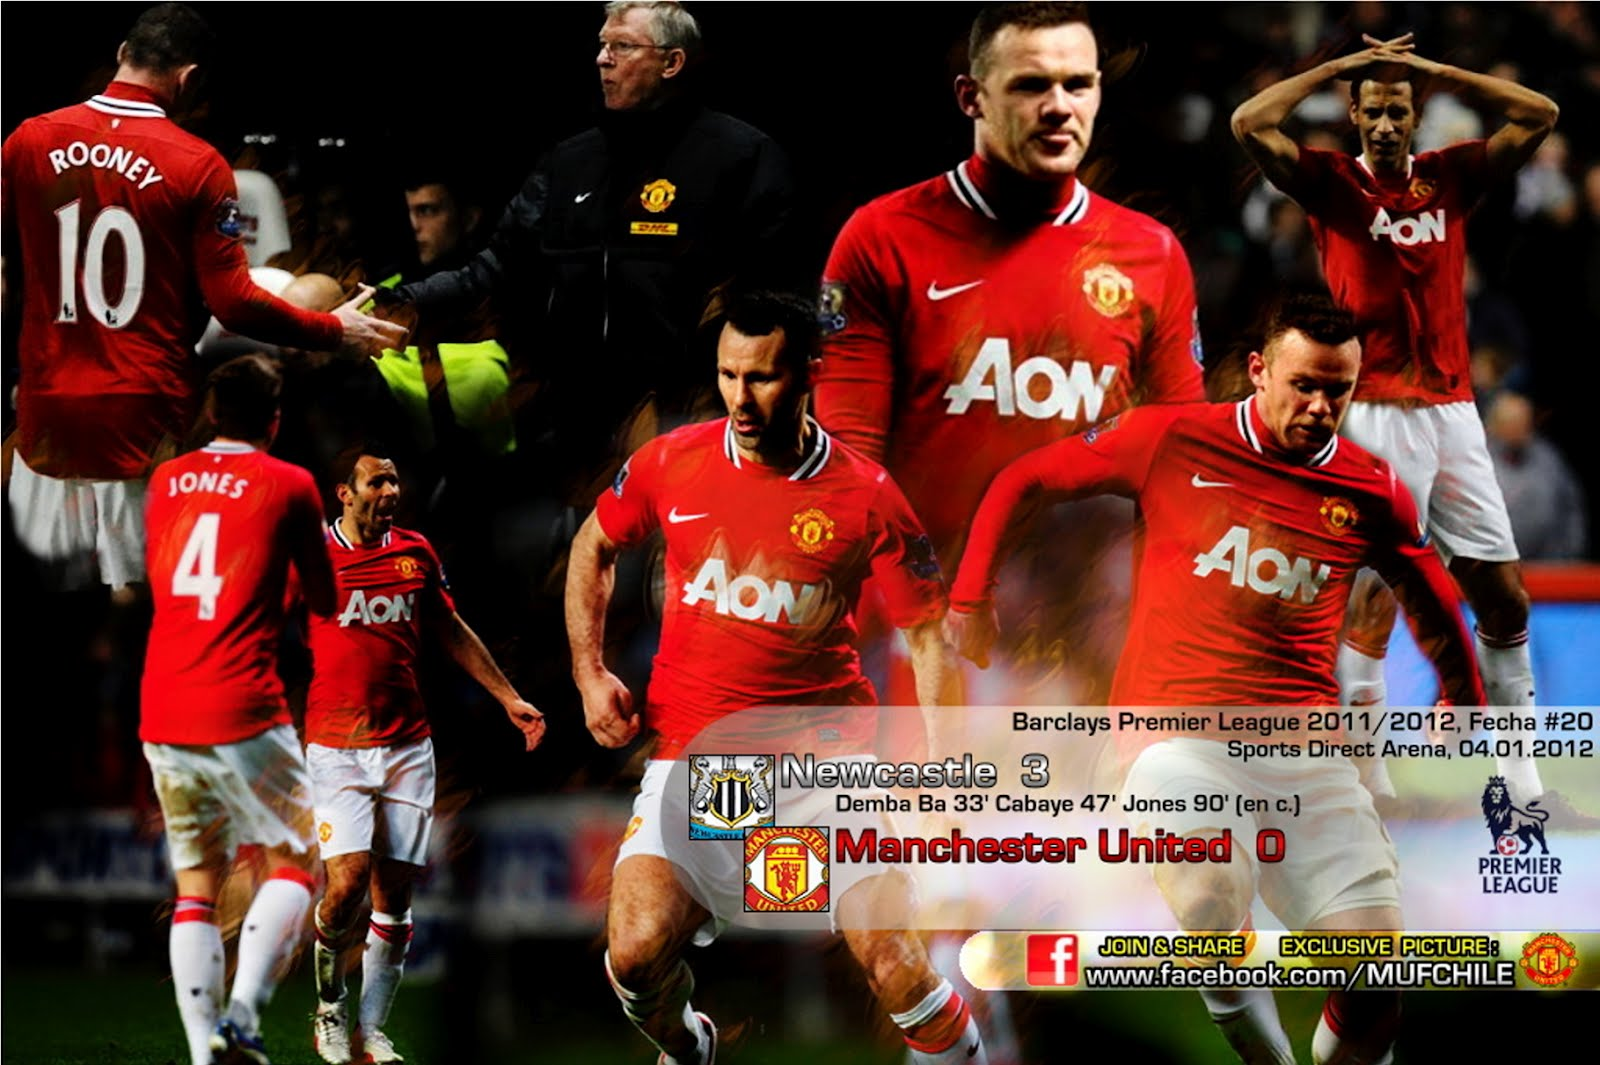 http://3.bp.blogspot.com/-ecTCRZD_VJg/T3v3AoR3s6I/AAAAAAAAA7g/RD1riBoB_Co/s1600/Manchester-United-Squad-2011-2012-wallpaper.jpg